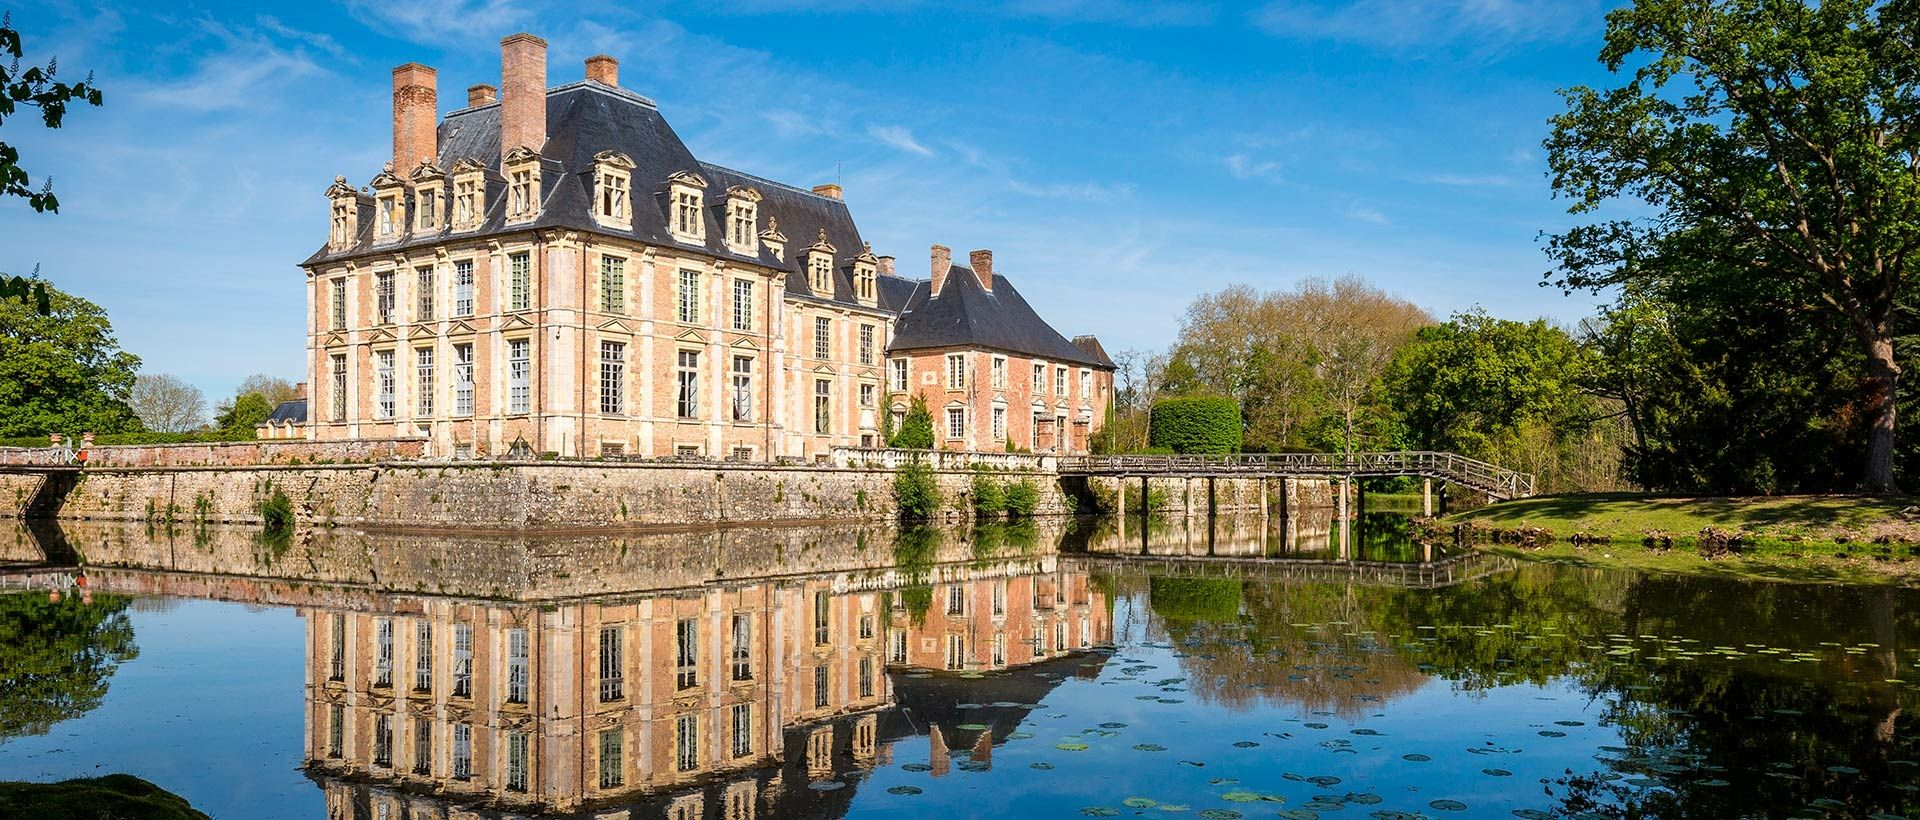 Camping Château de la Ferté-Saint-Aubin